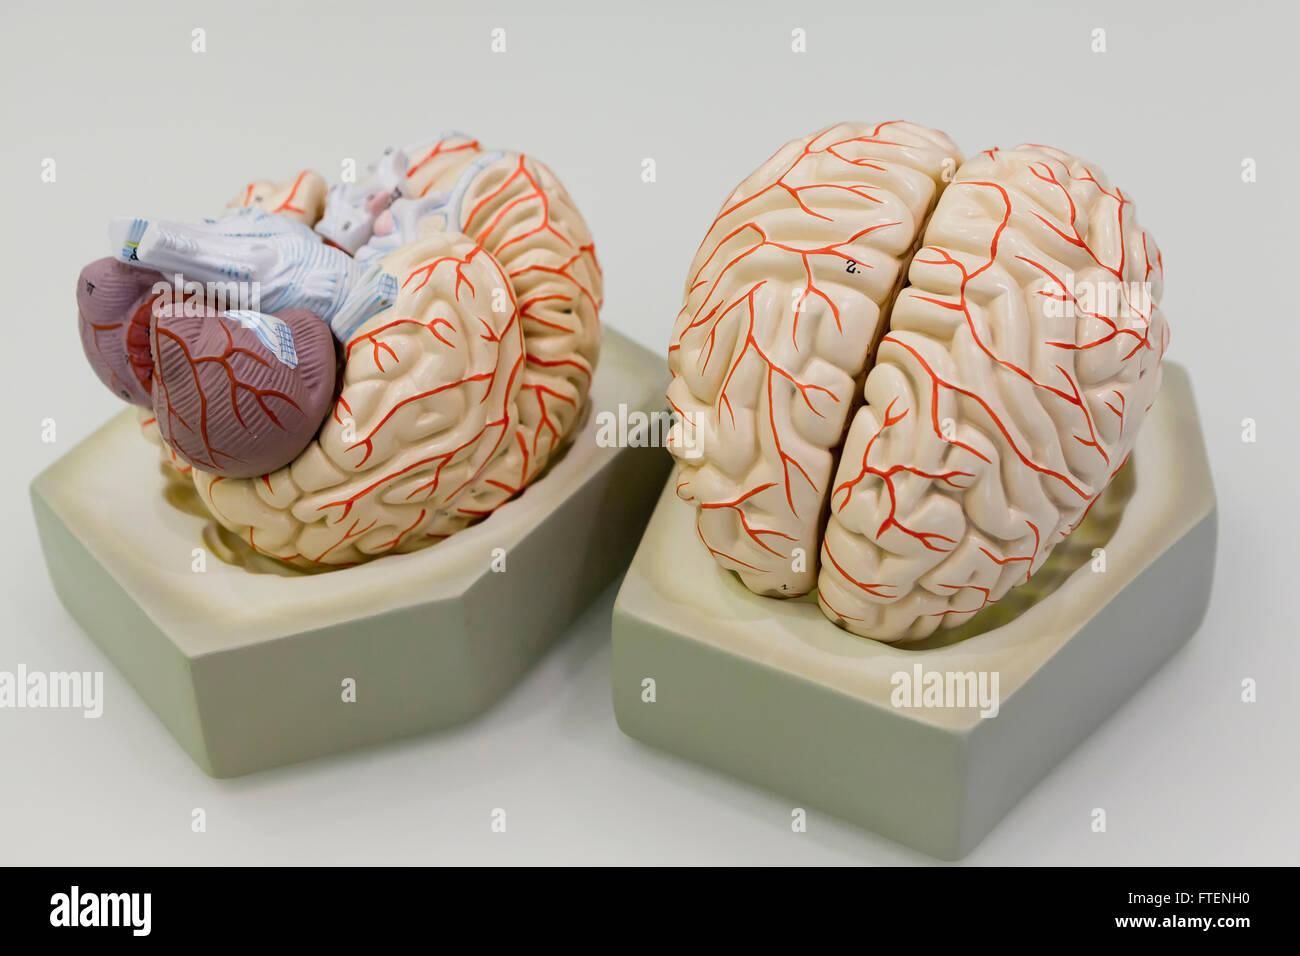 Human Brain Model Anatomical Stock Photos Human Brain Model